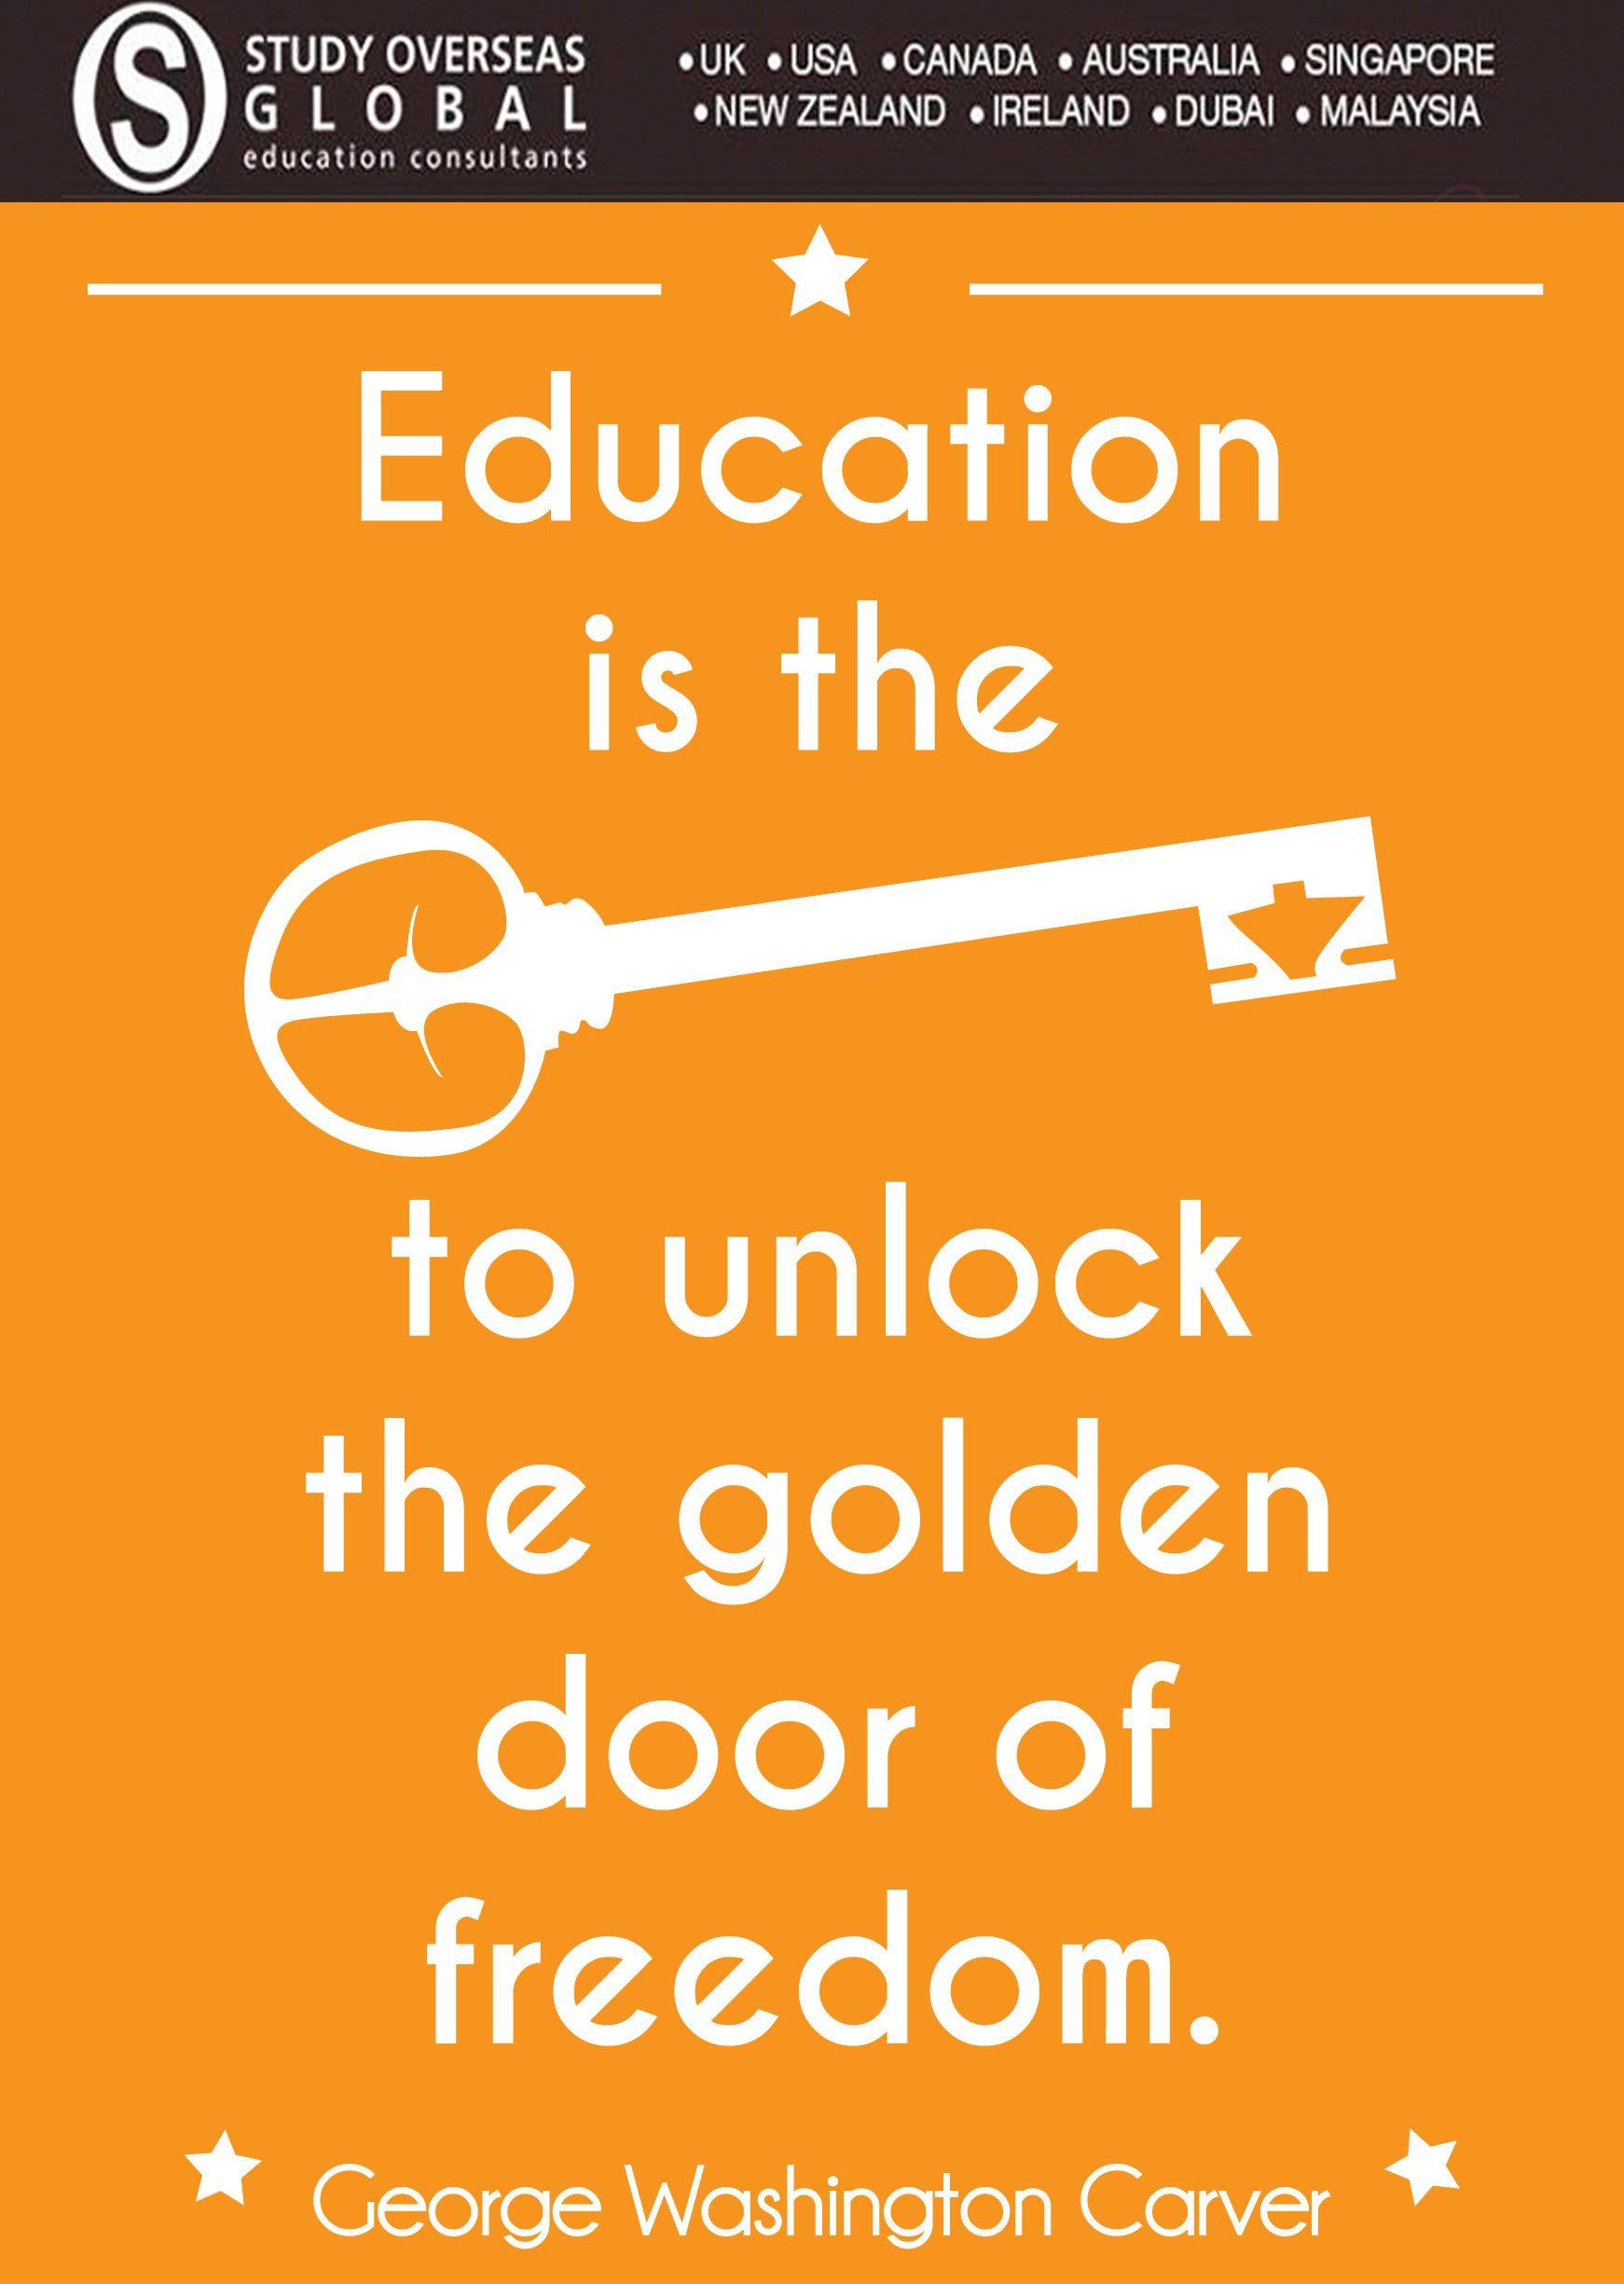 #educationquote #studyoverseas Motivational Post